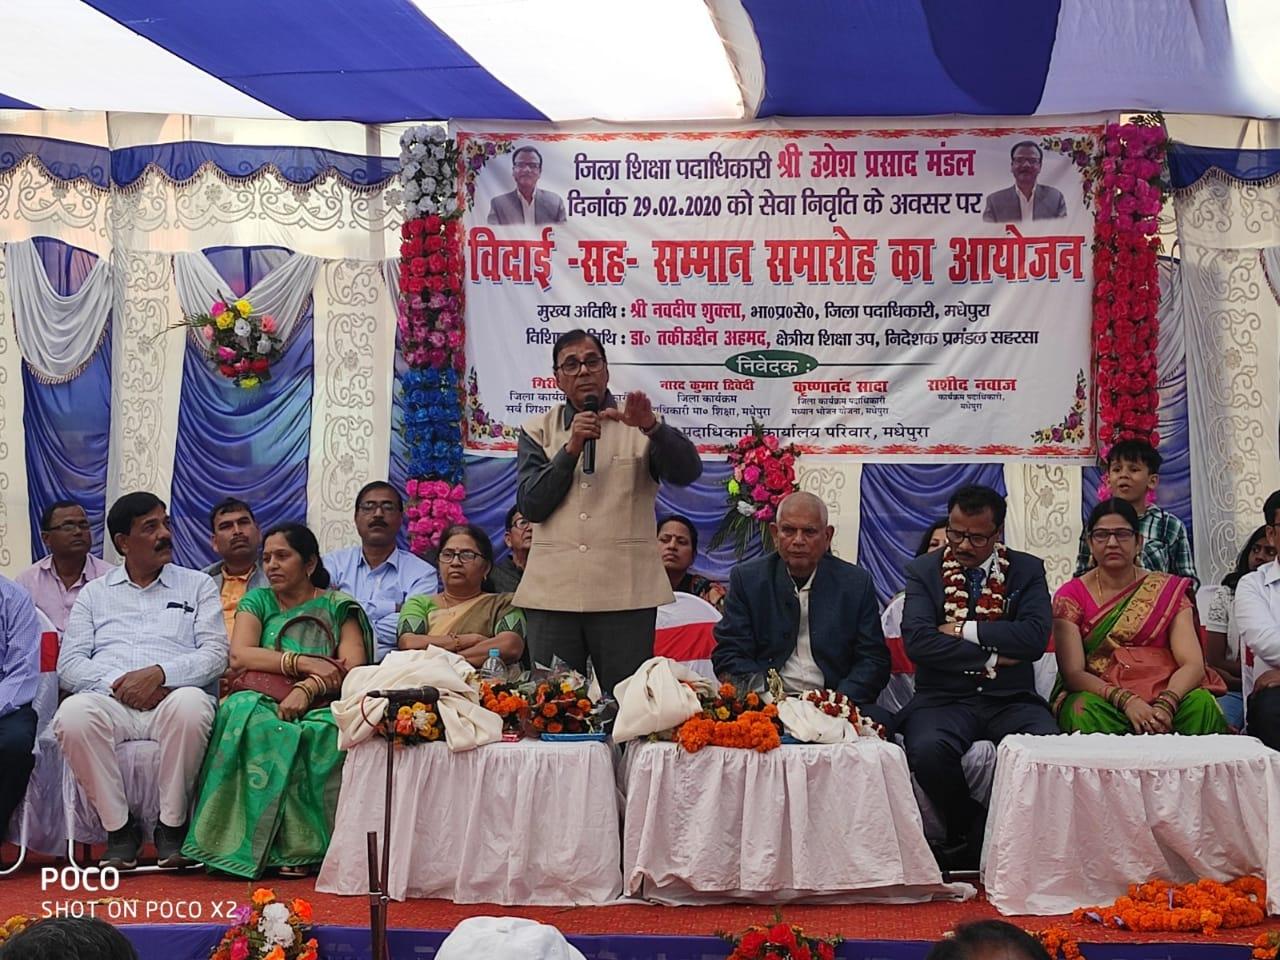 Shikshavid Dr.Bhupendra Madhepuri addressing the farewell of DEO Yugresh Prasad Mandal at Madhepura.